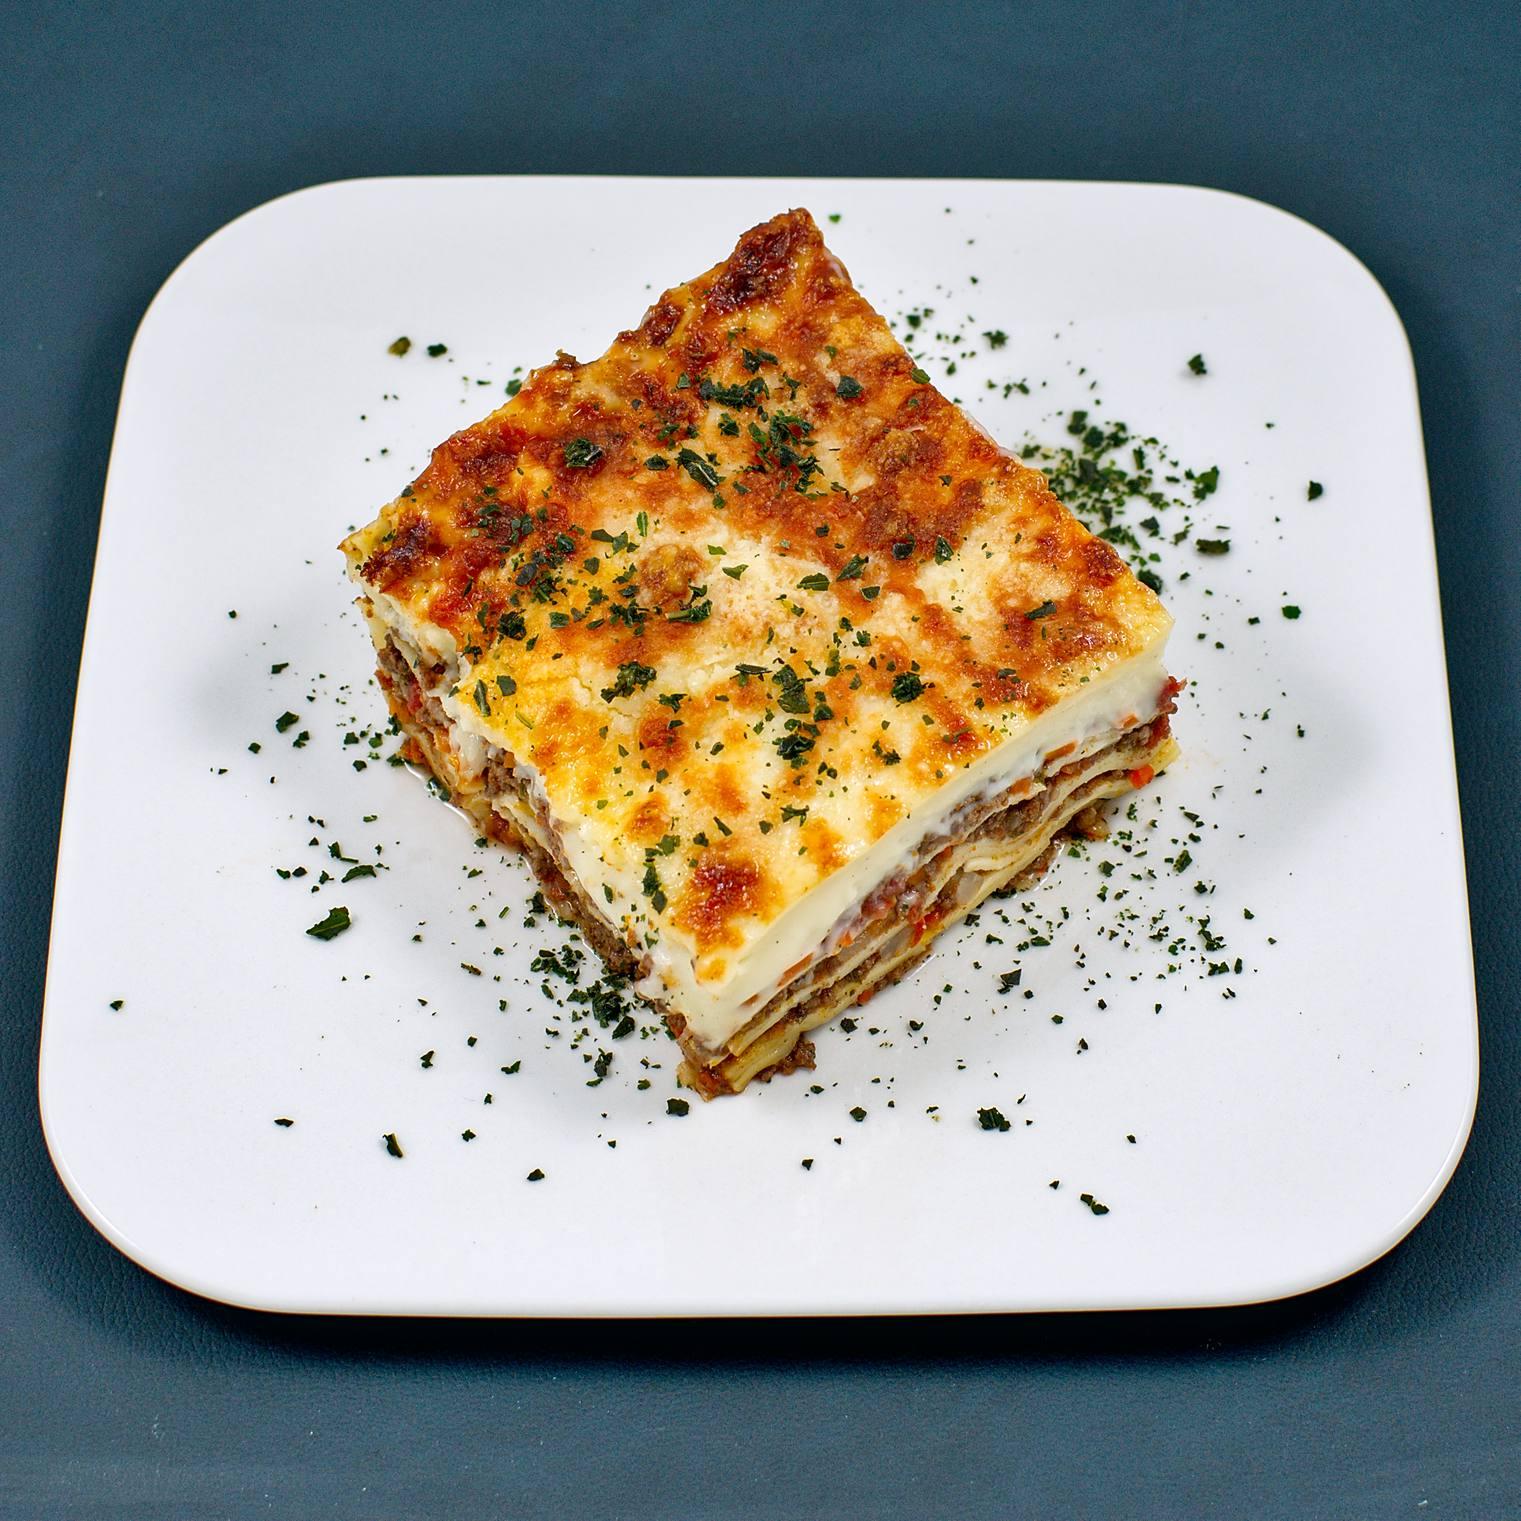 Lasagne | Reh-Ragout | Béchamel | selbstgemachte Lasagneblätter